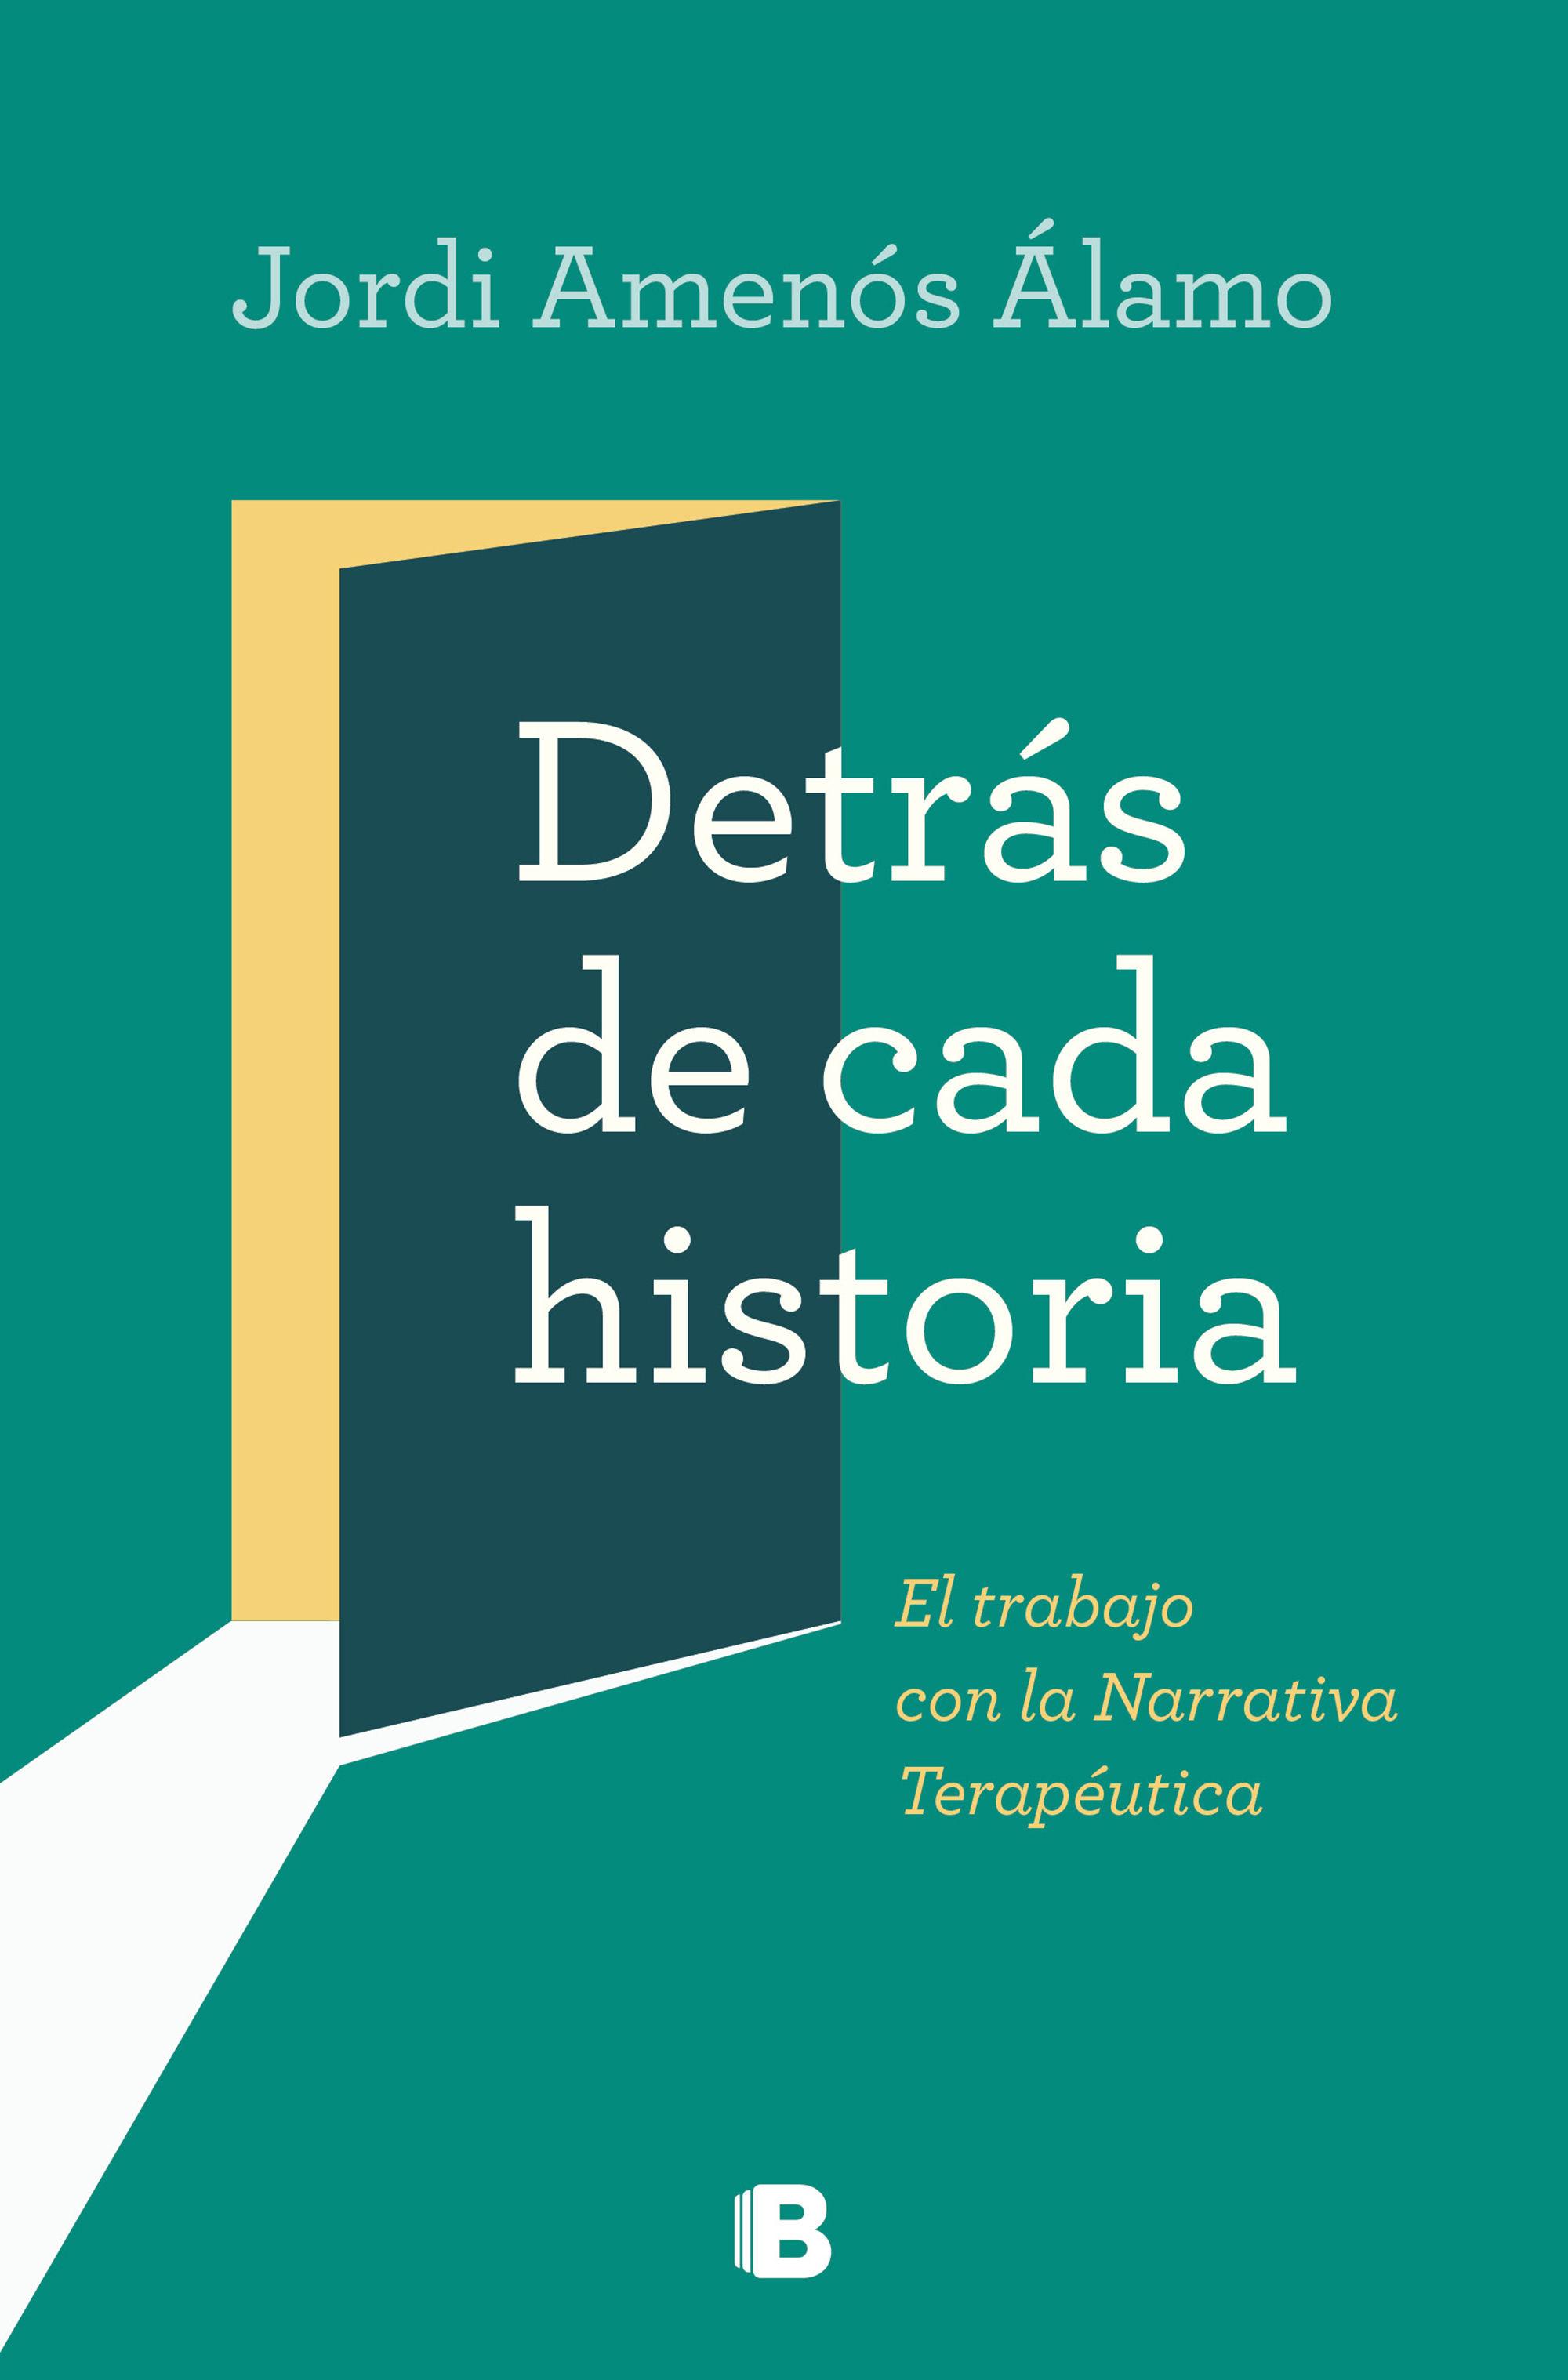 DETRAS DE CADA HISTORIA